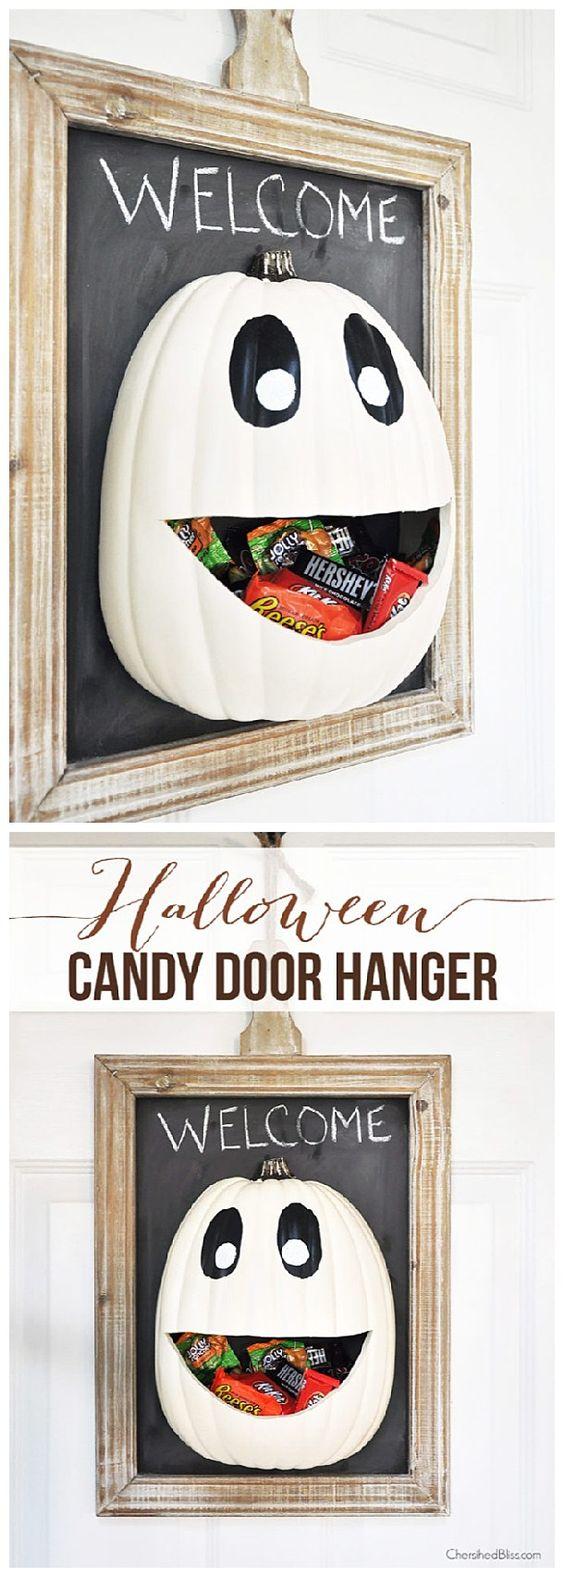 DIY Halloween Candy Pumpkin Face Door Hanger Decoration | Cherished Bliss = Spooktacular Halloween DIYs, Crafts and Projects - The BEST Do it Yourself Halloween Decorations: